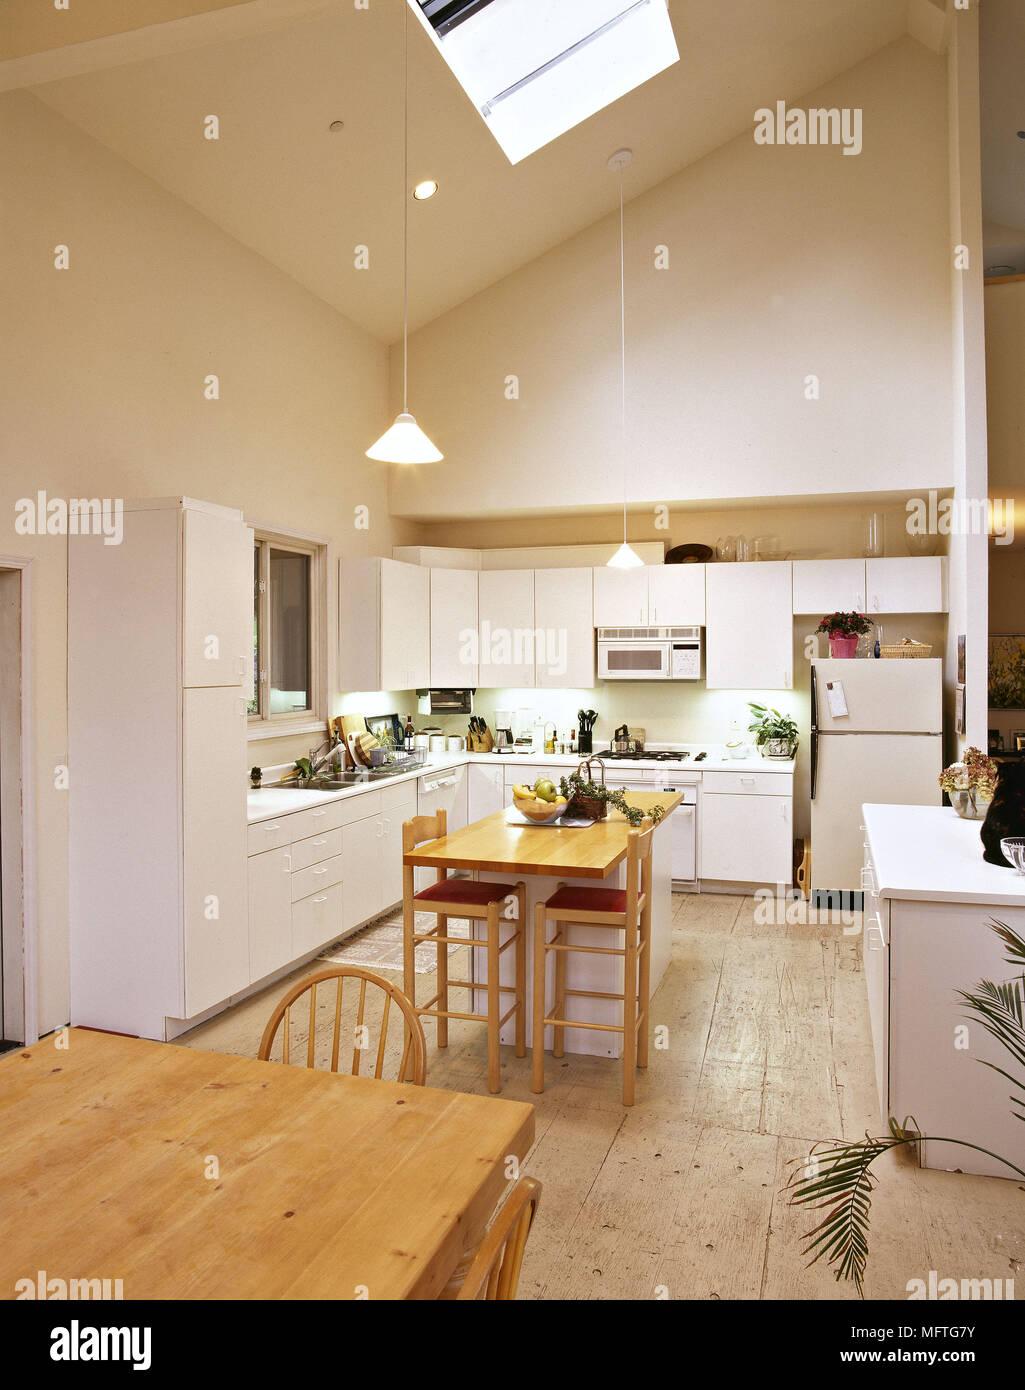 Moderna cocina comedor unidades blanco isla central desayuno bar ...